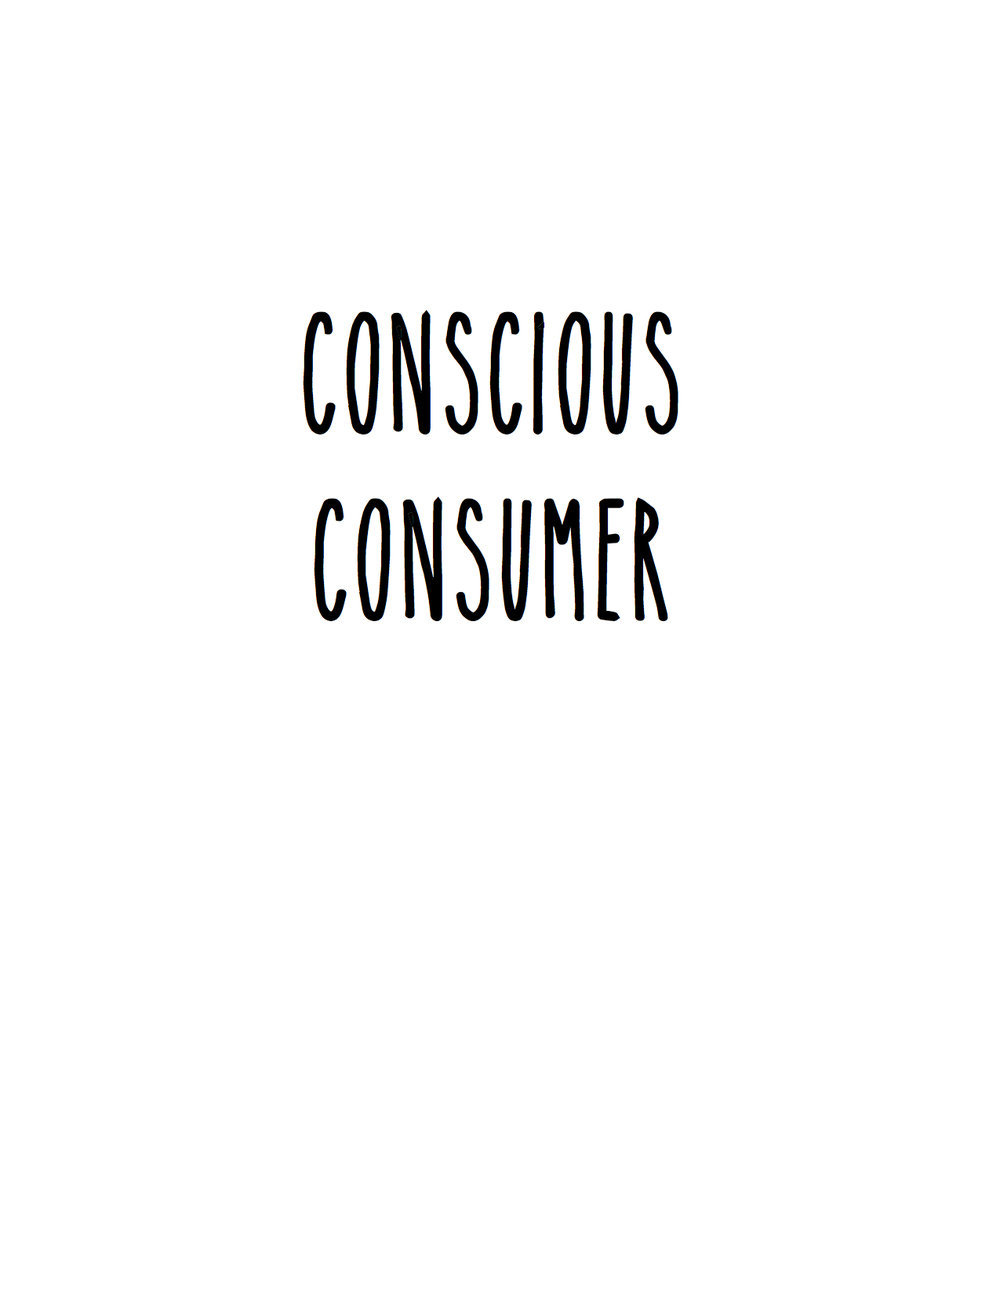 Conscious Consumer.jpg